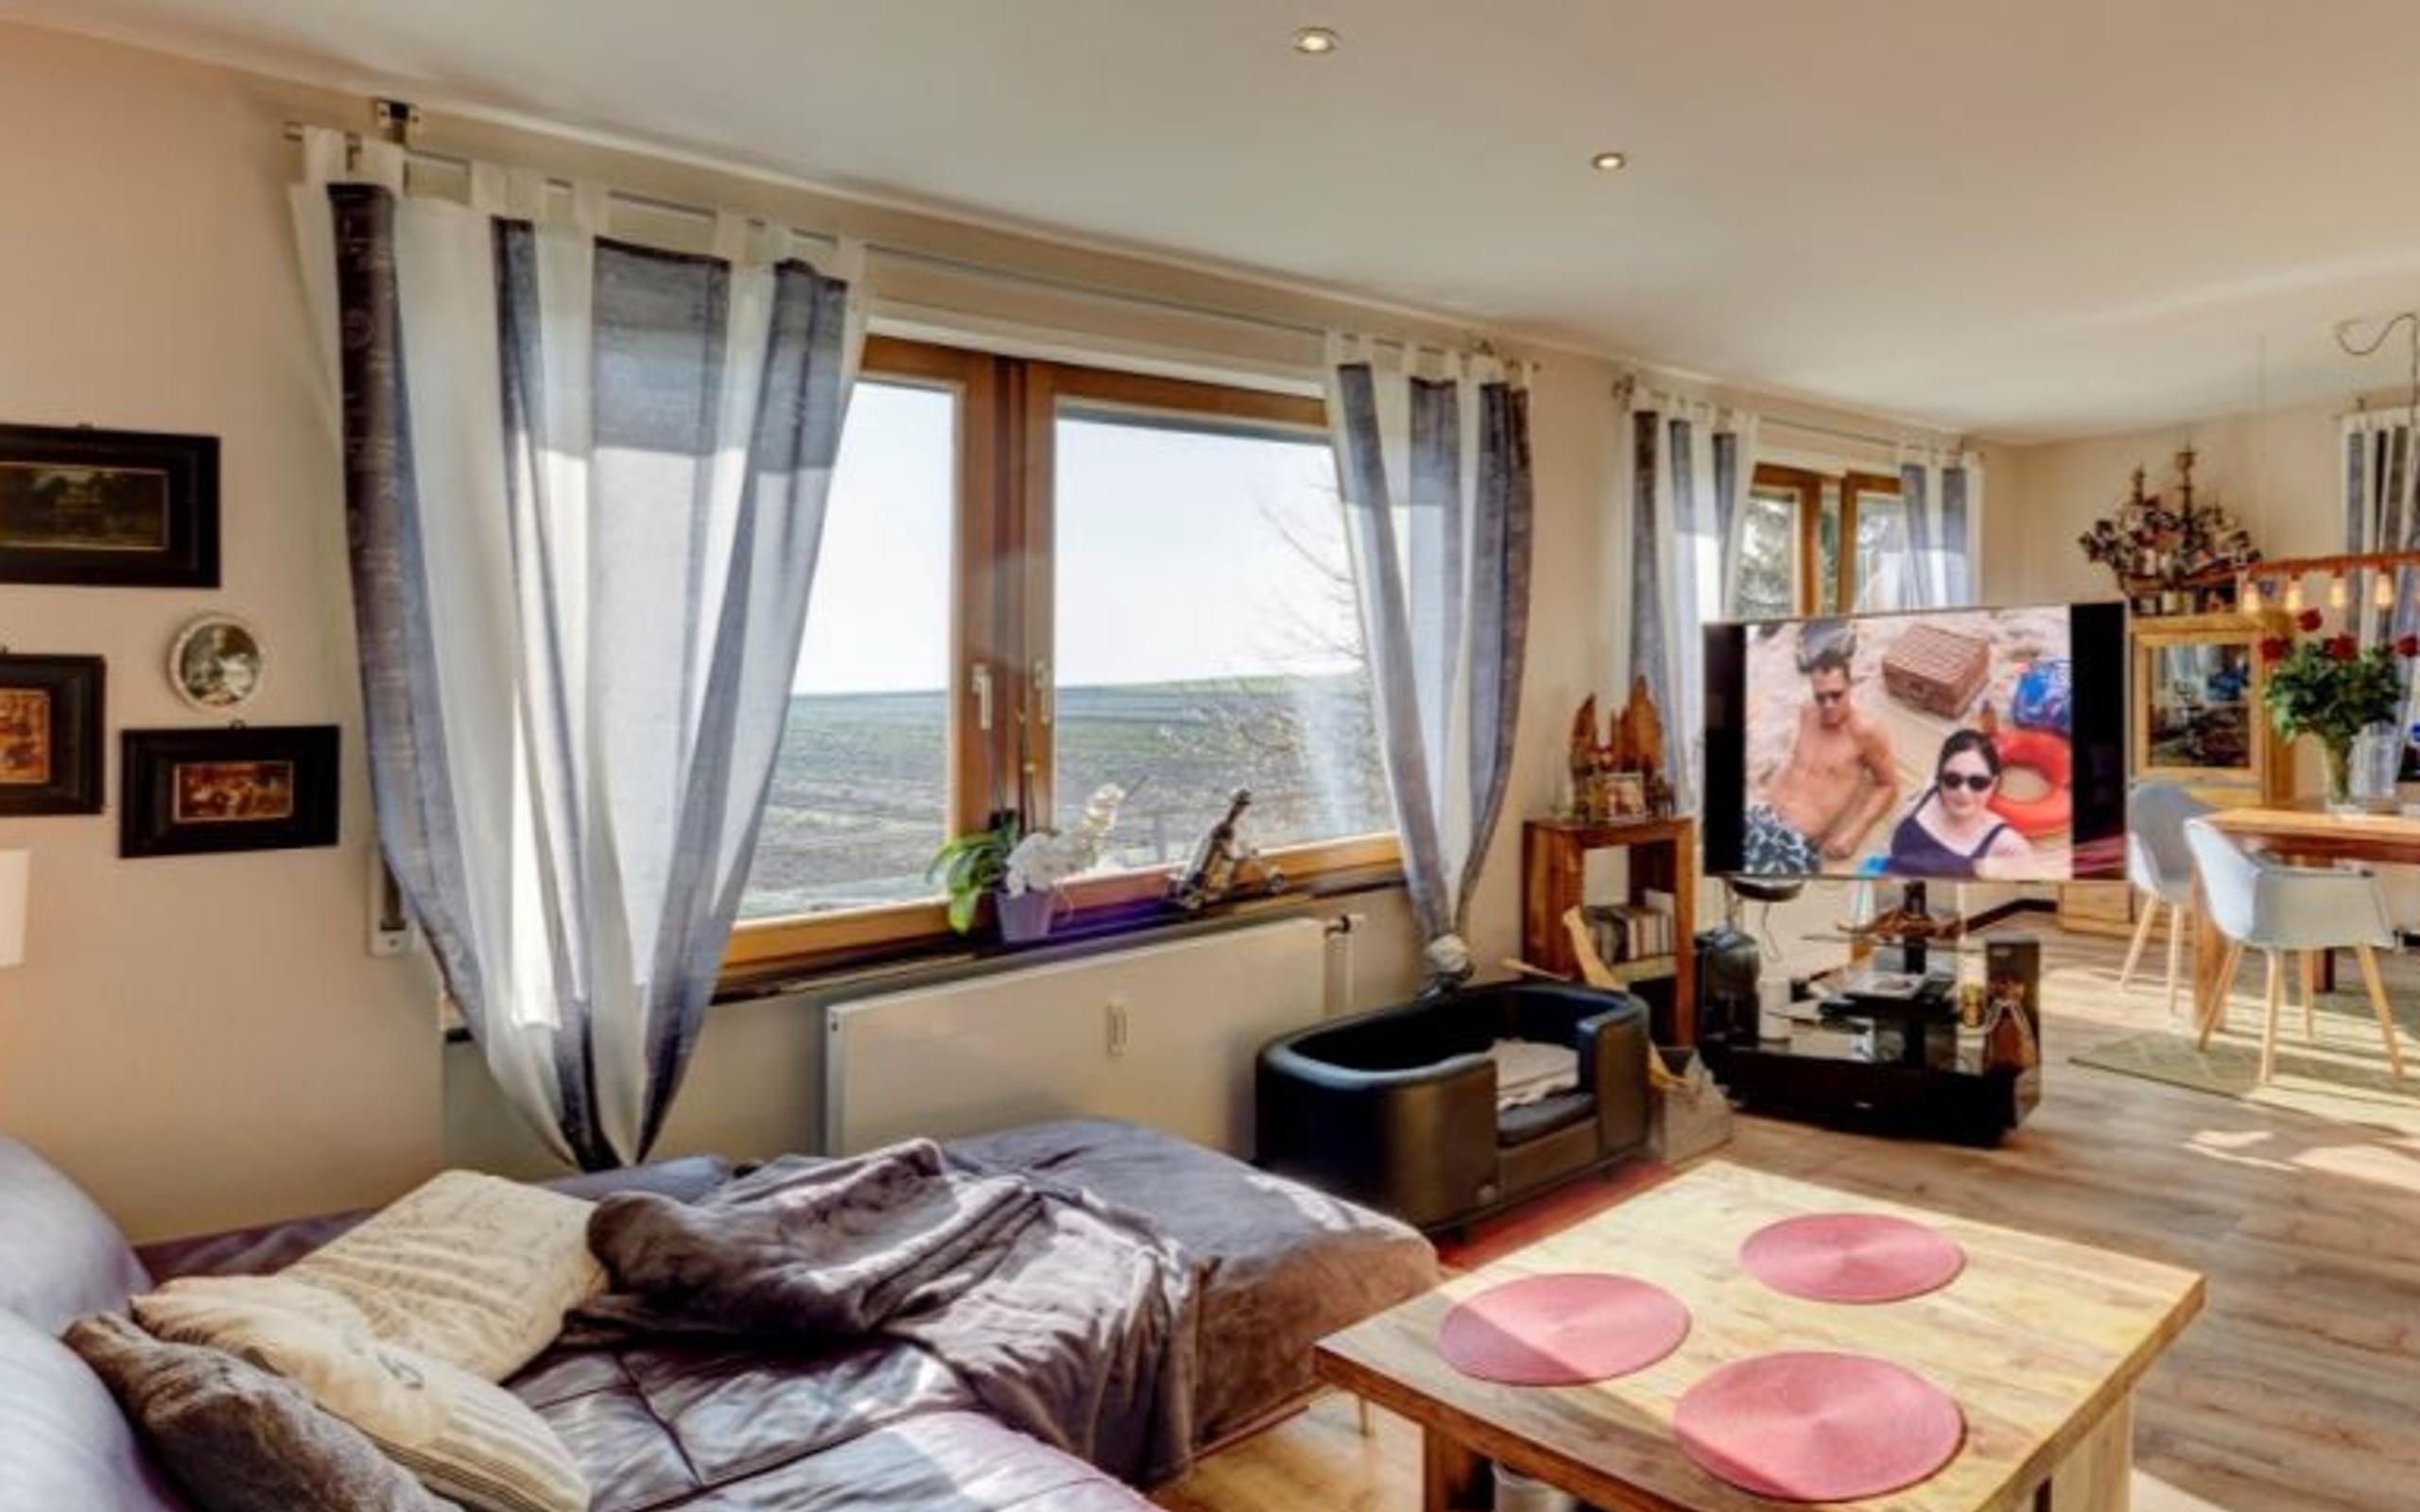 Großes Bad premium 2 zimmer apartment mit tv balkon küche grosses